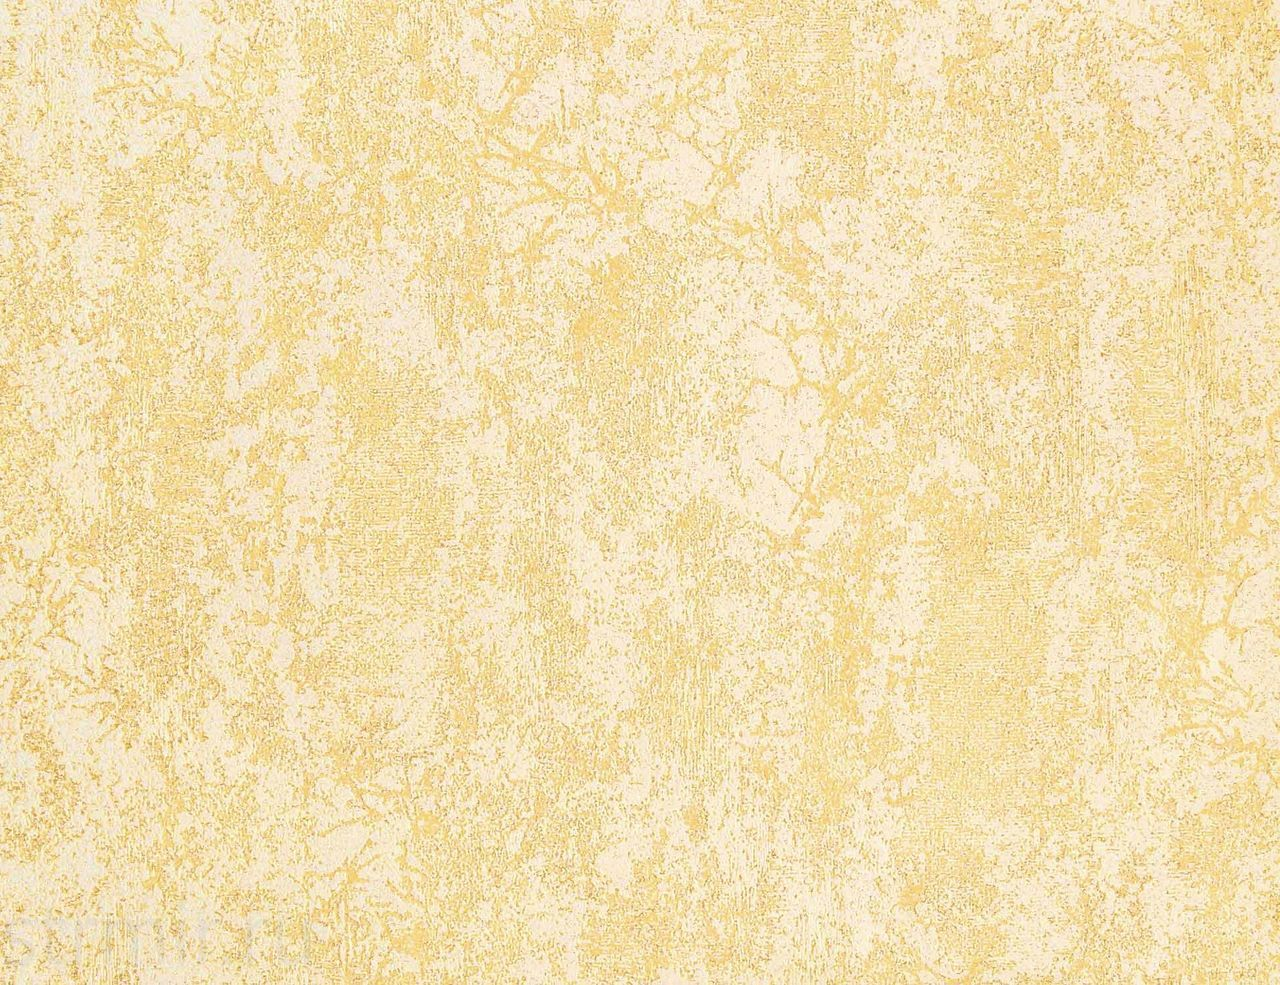 0029-61 ОБОИ 0,5*15 м  винил Камелот крем